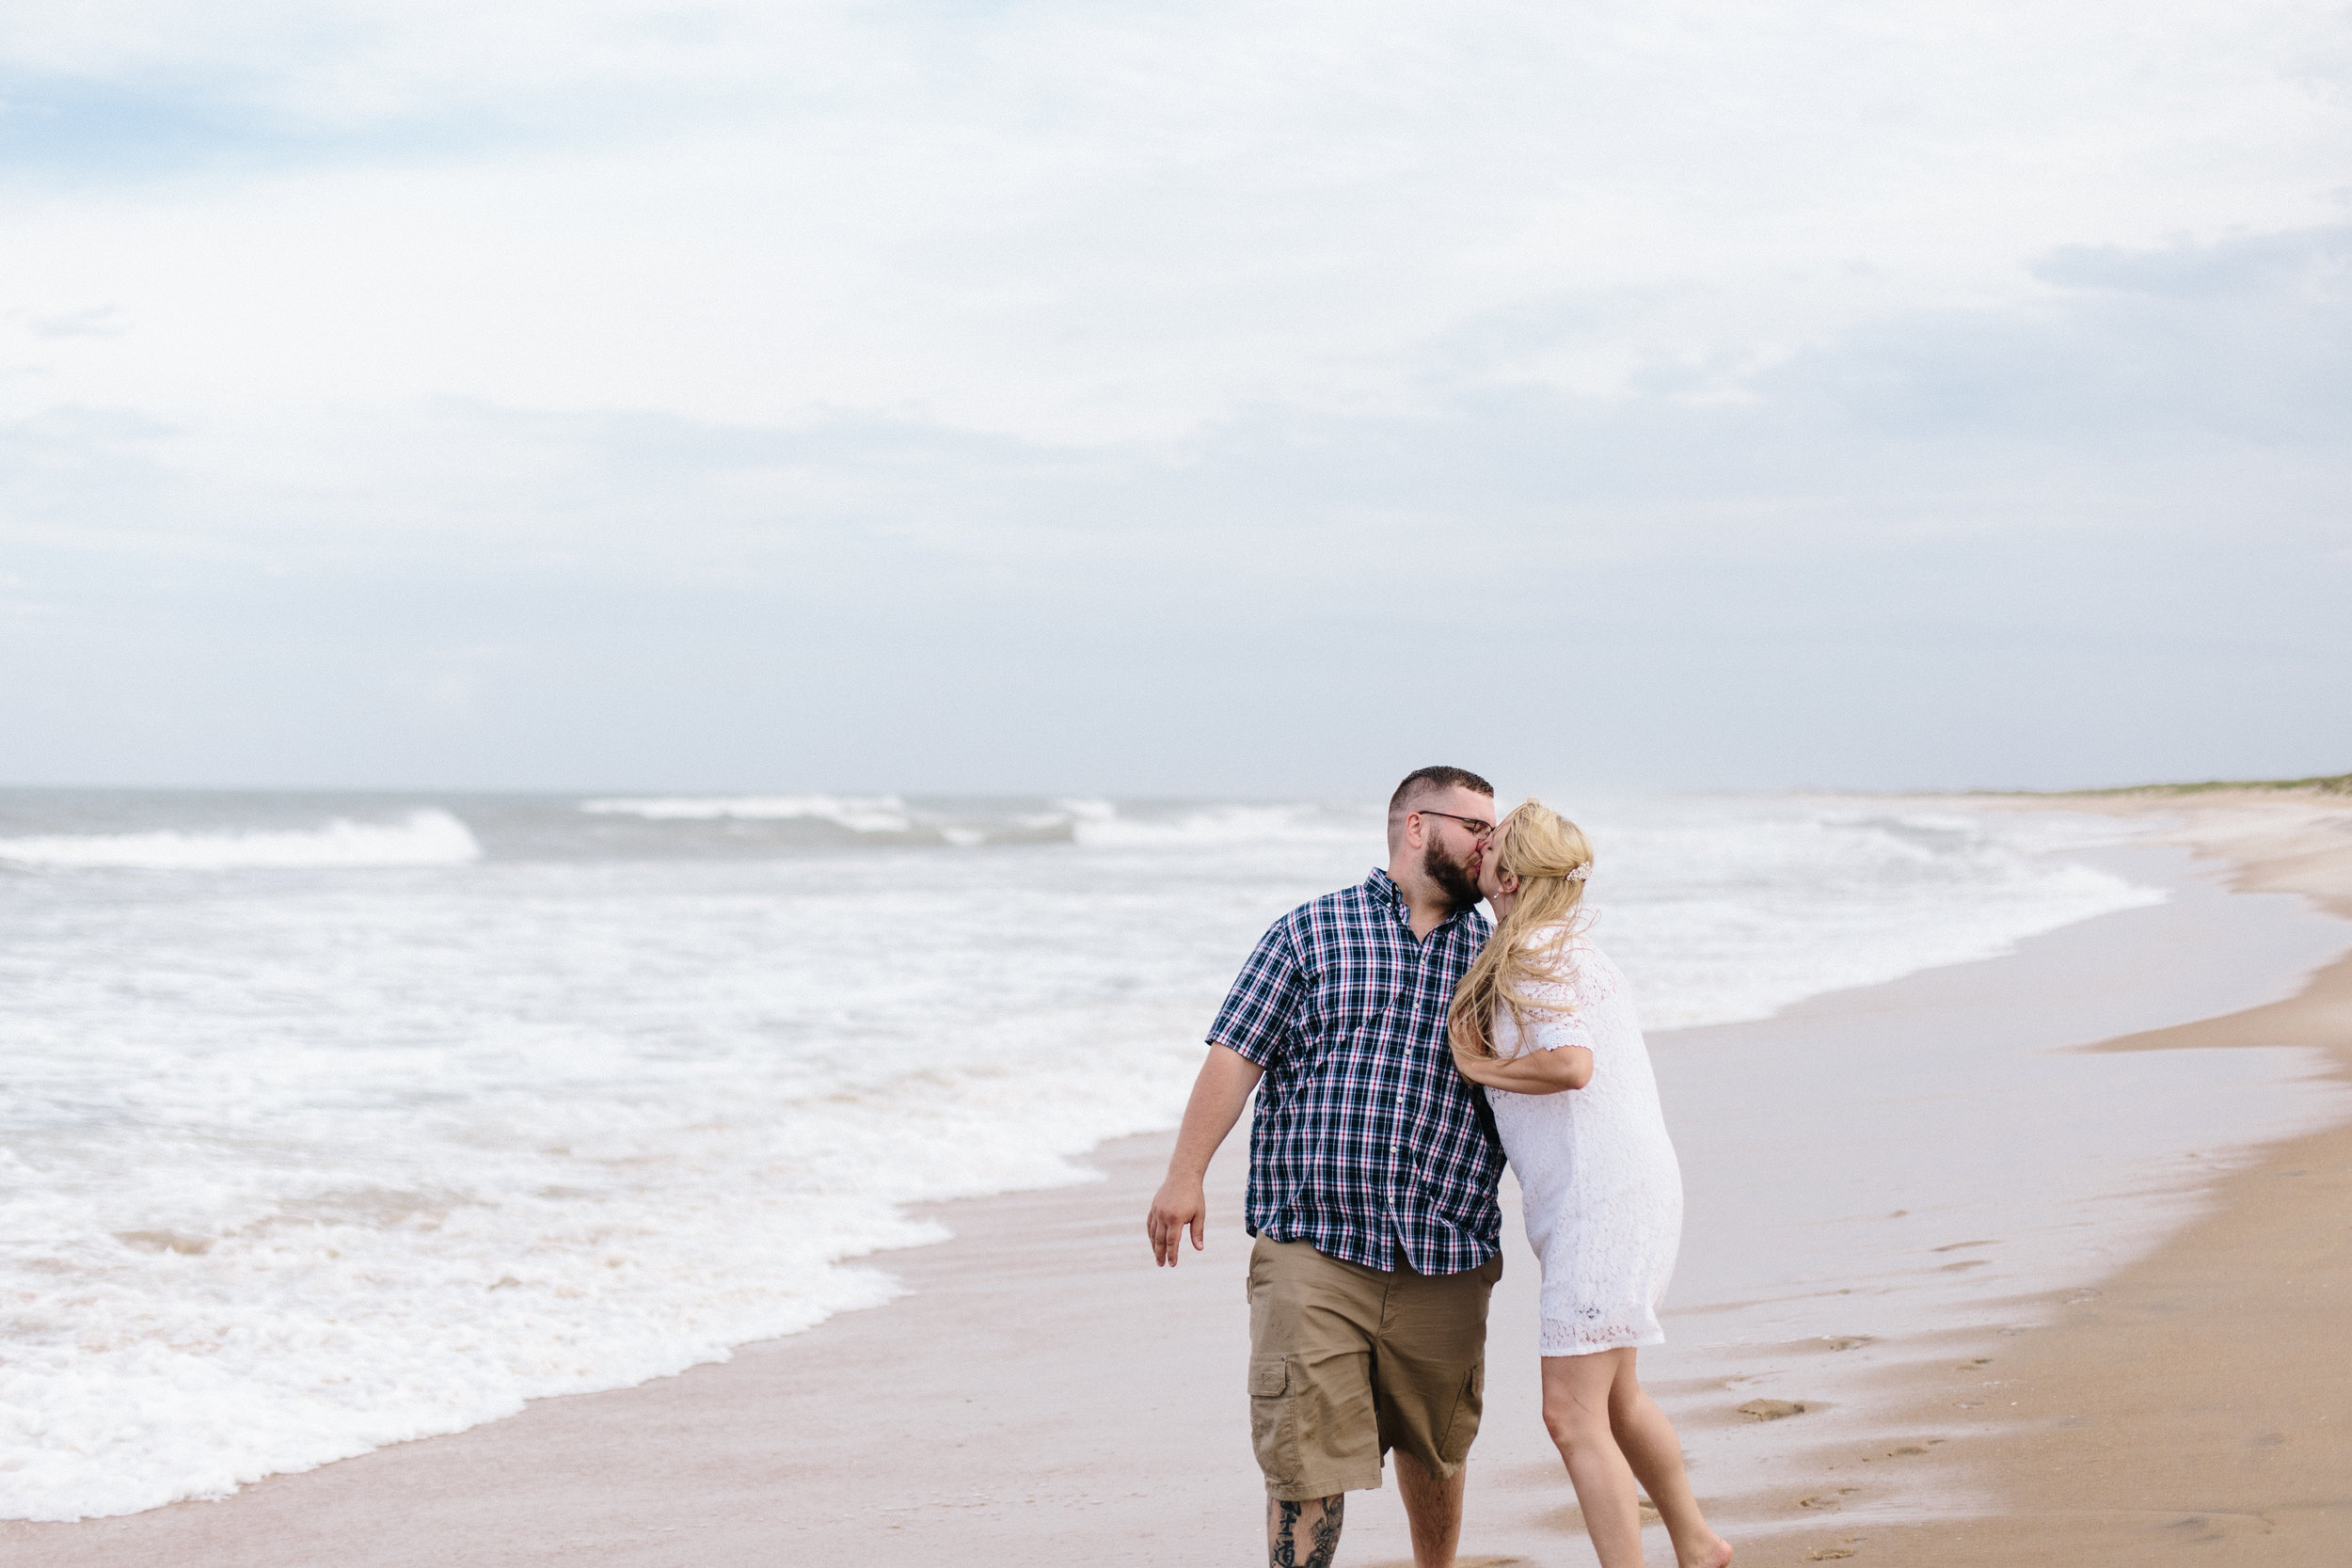 alyssa barletter photography destination wedding travel elopement obx north carolina beach-7.jpg